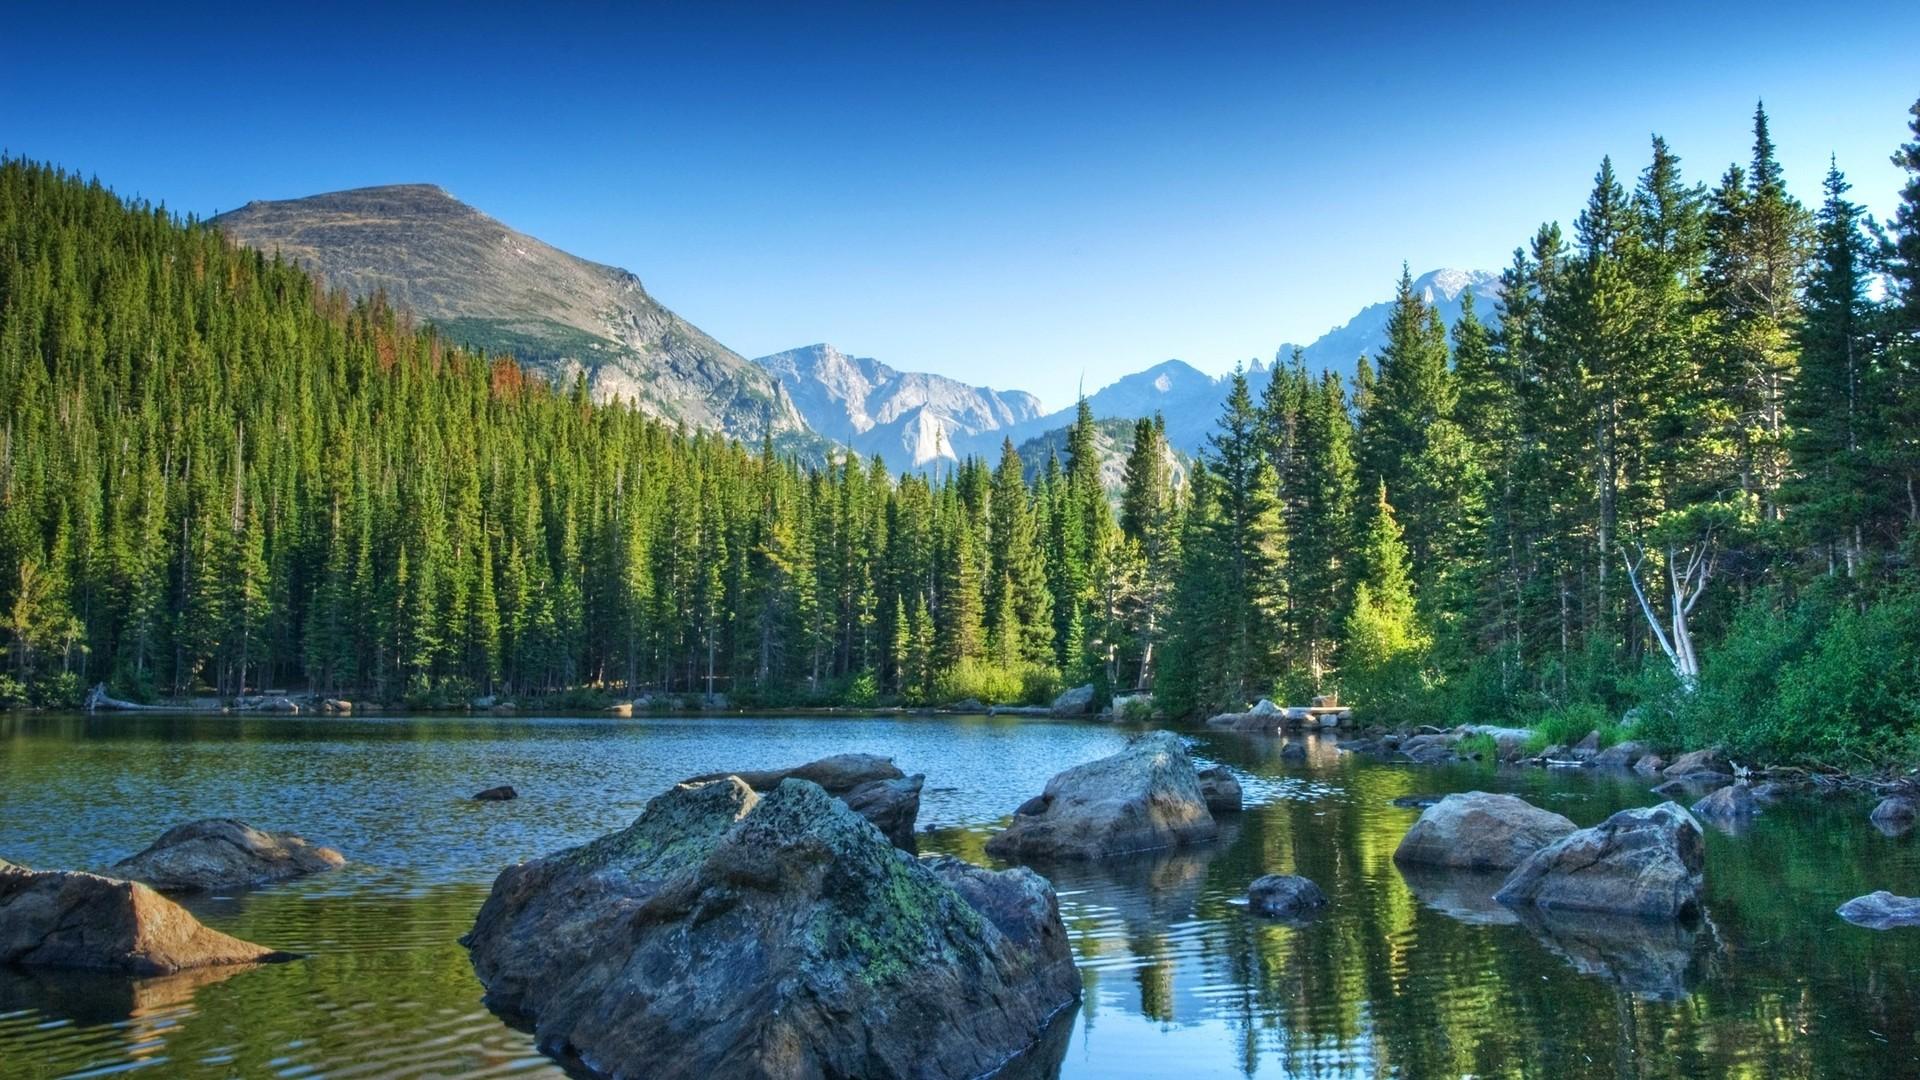 The Rockies Wallpaper HD